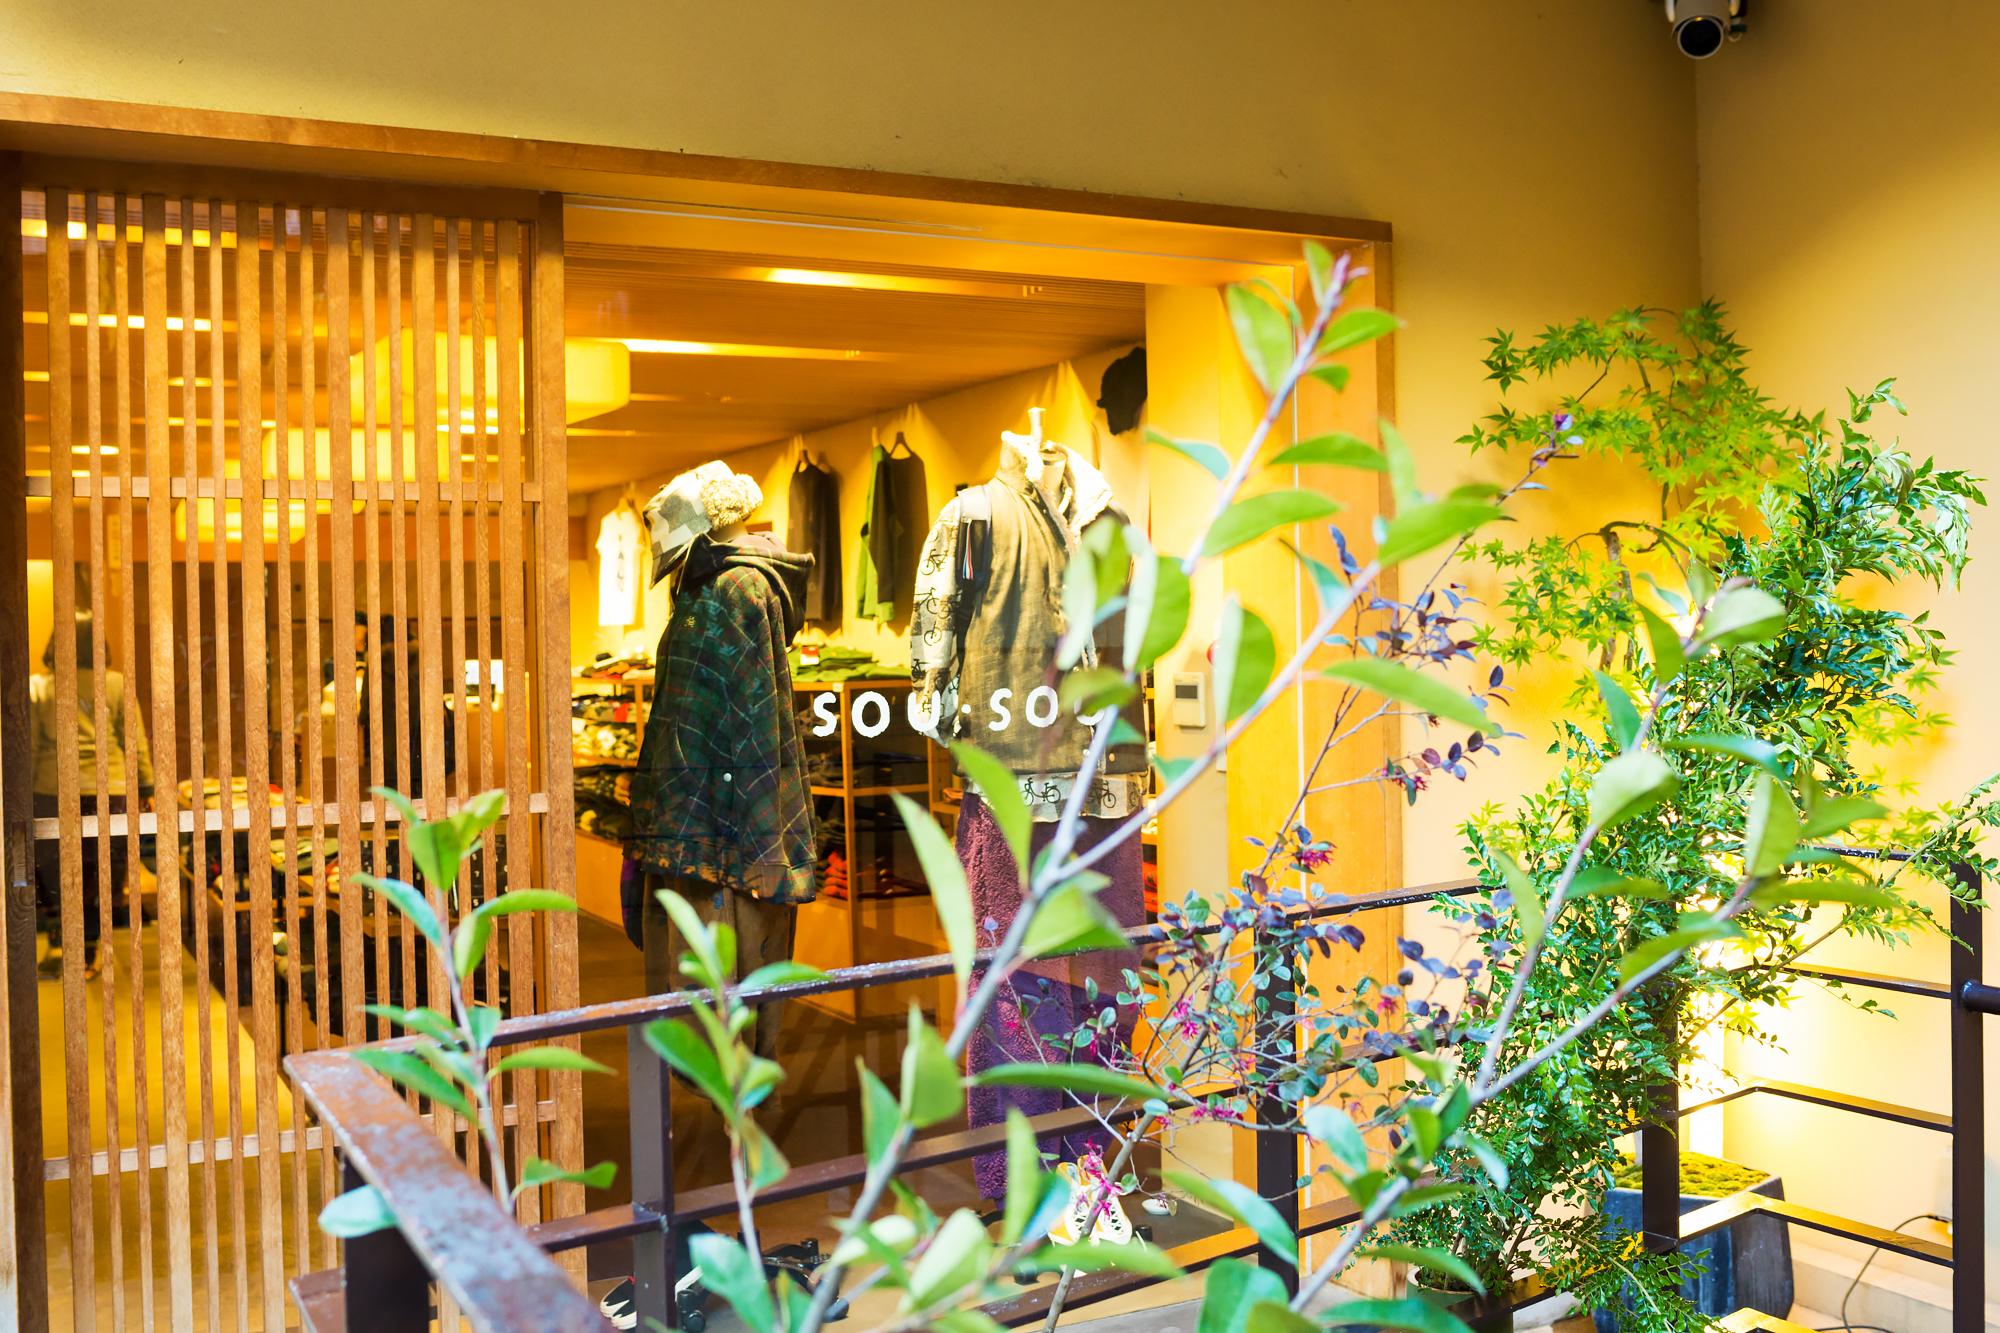 le coq sportif (ルコックスポルティフ)コラボ・京都のテキスタイル雑貨、和服のSOU・SOU(ソウソウ)